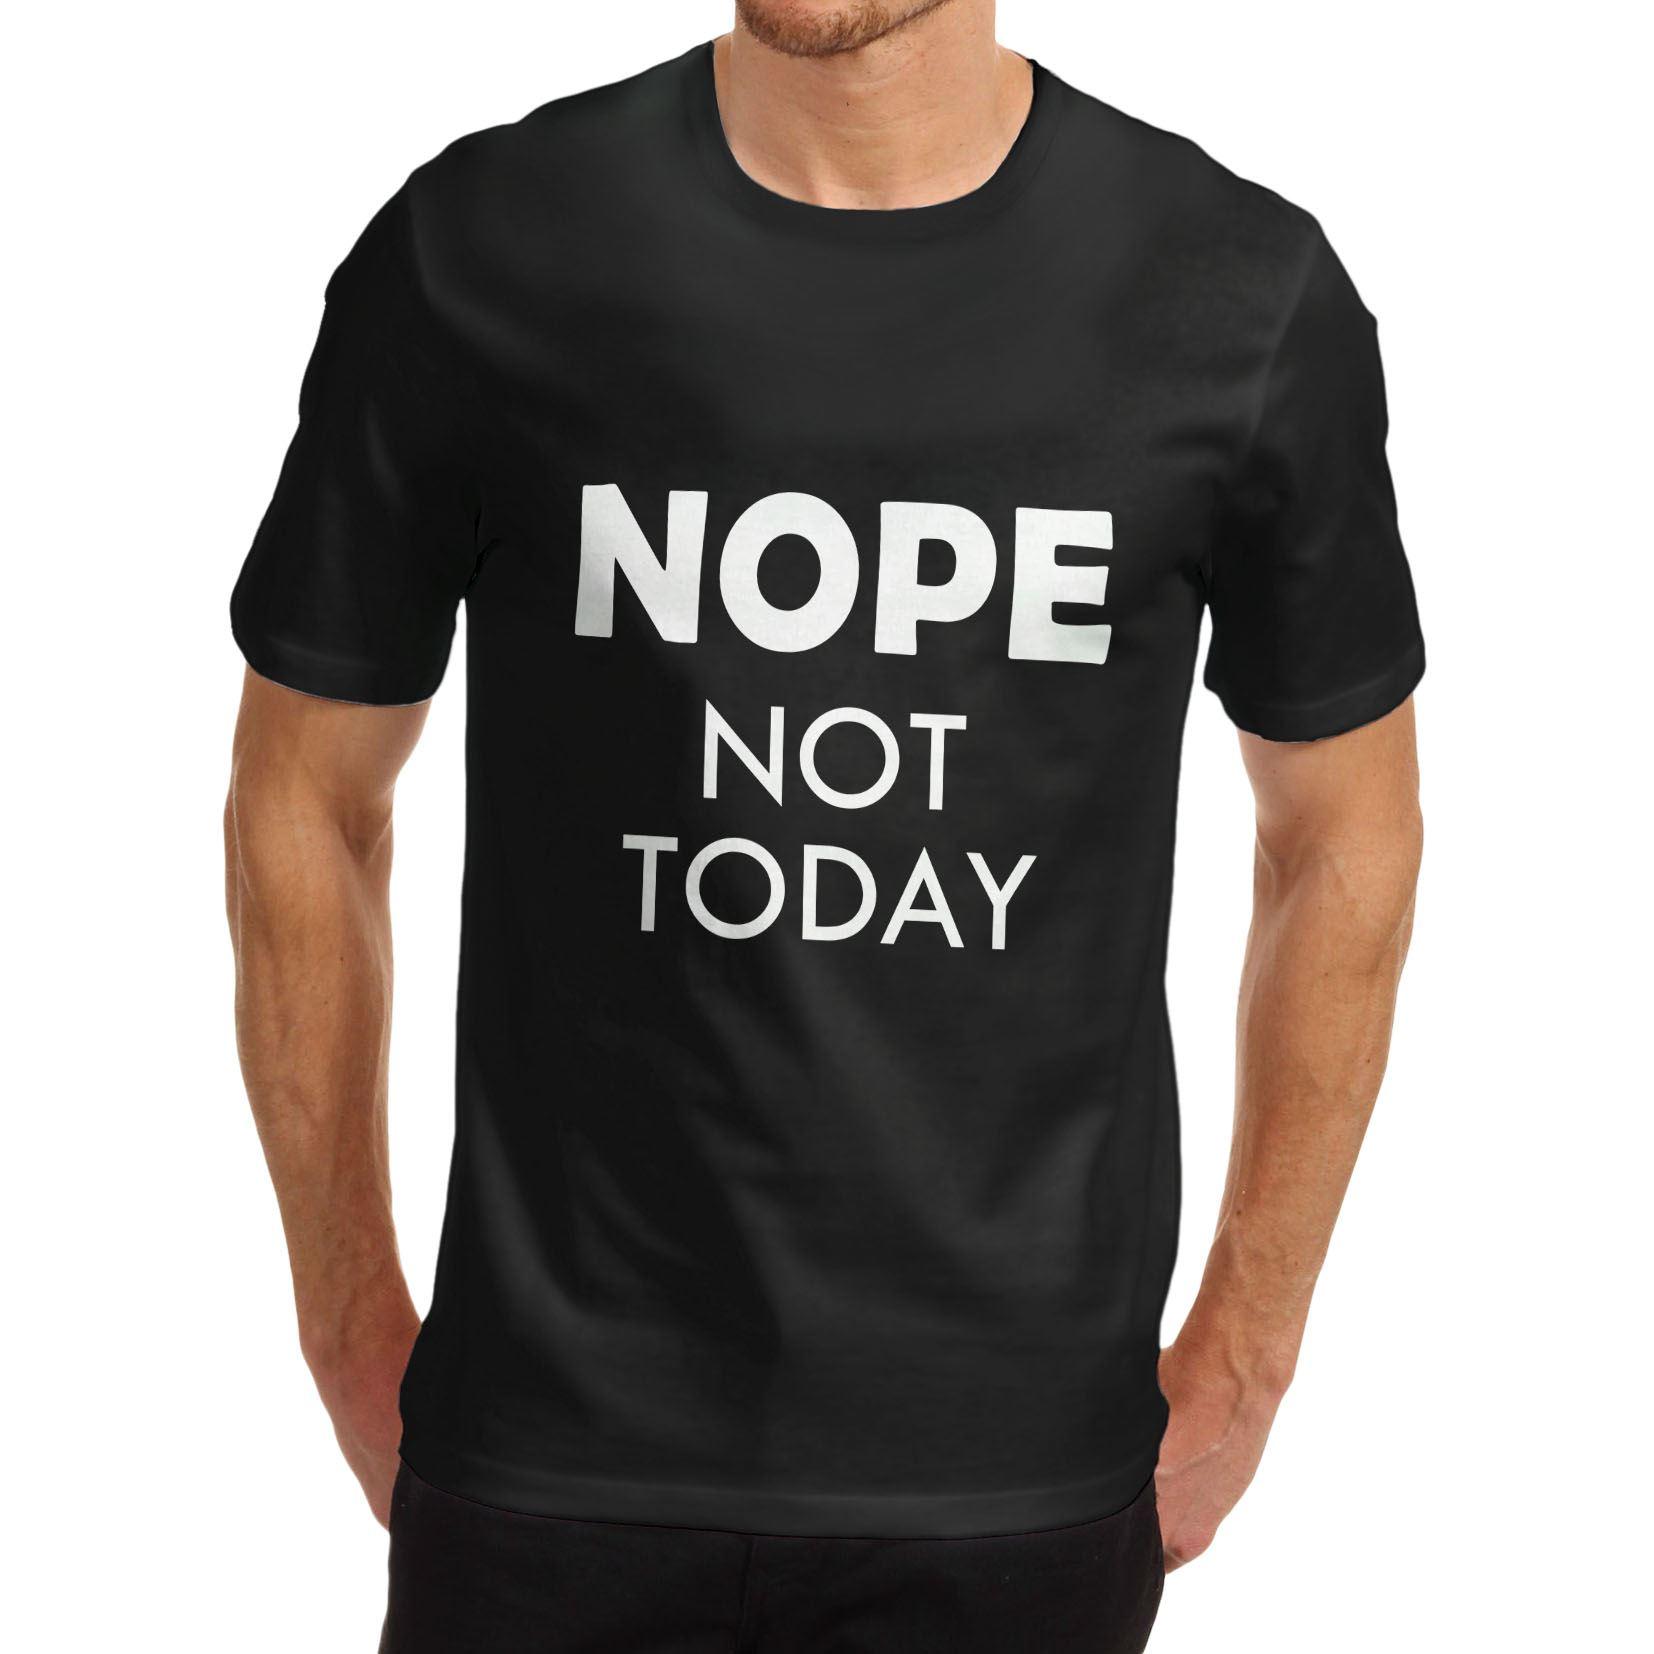 Black t shirt ebay - Men 039 S Nope Not Today Funny Joke